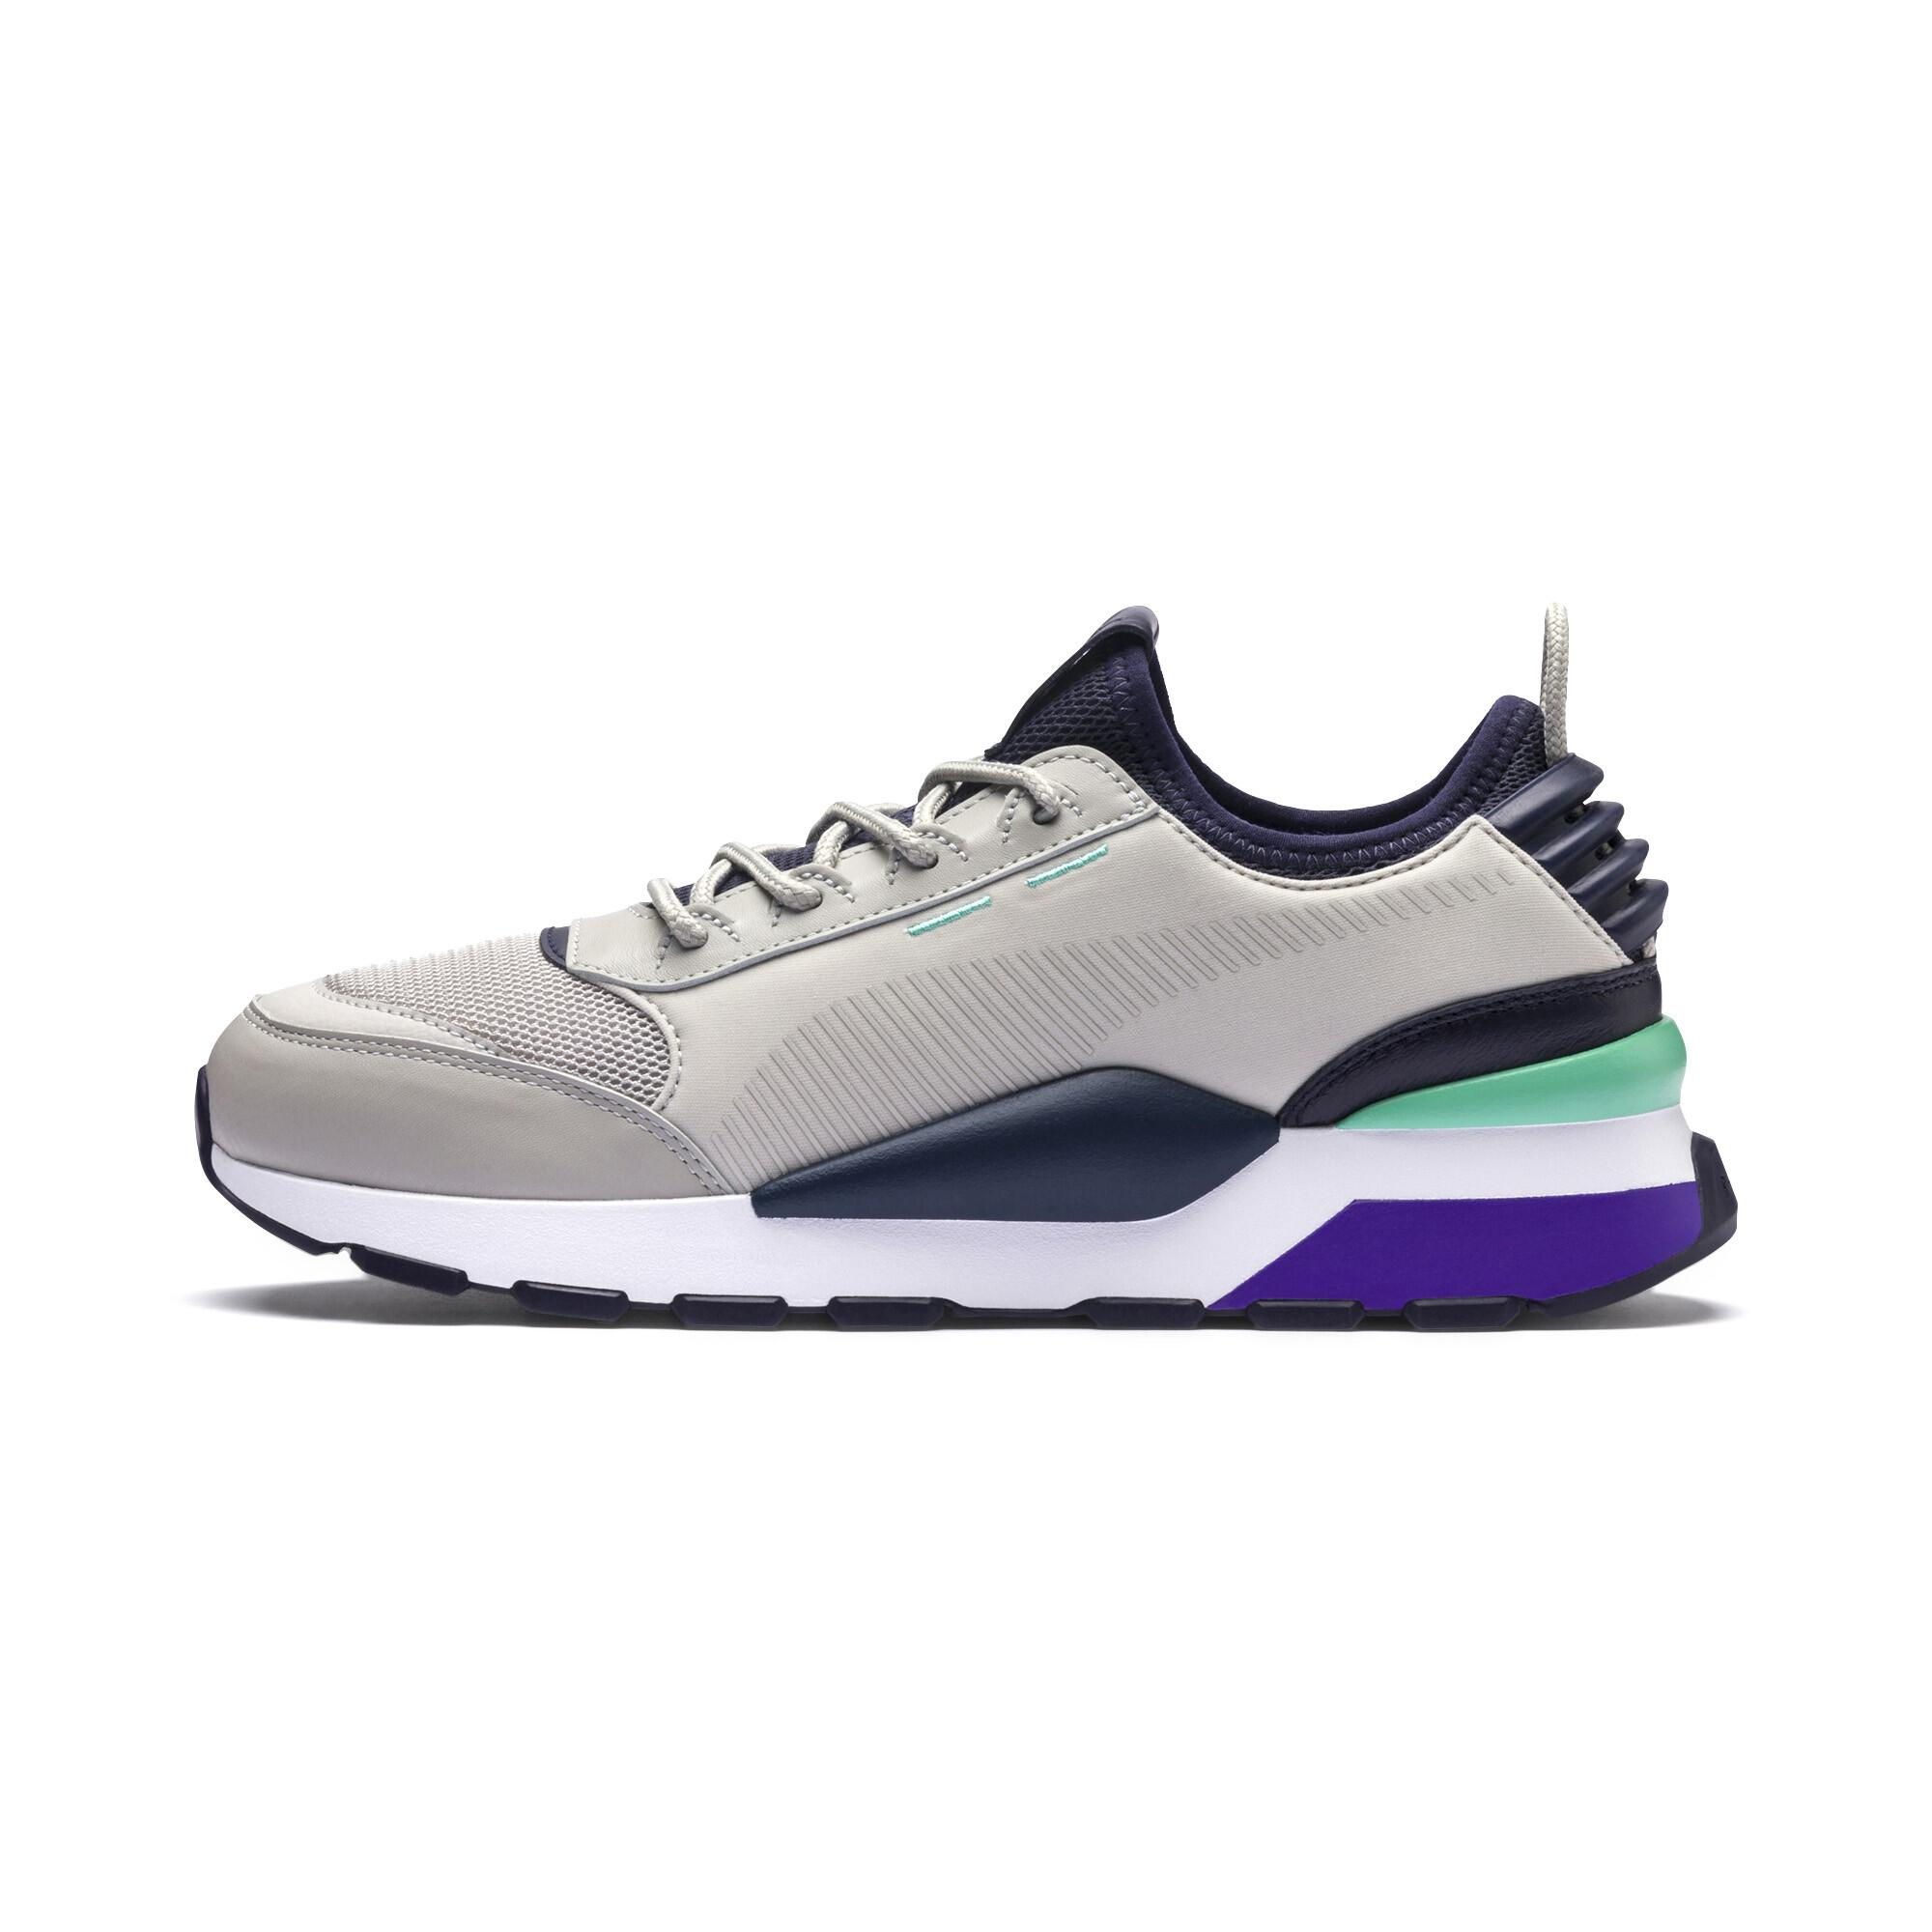 PUMA-RS-0-Tracks-Unisex-Shoe-Evolution thumbnail 4